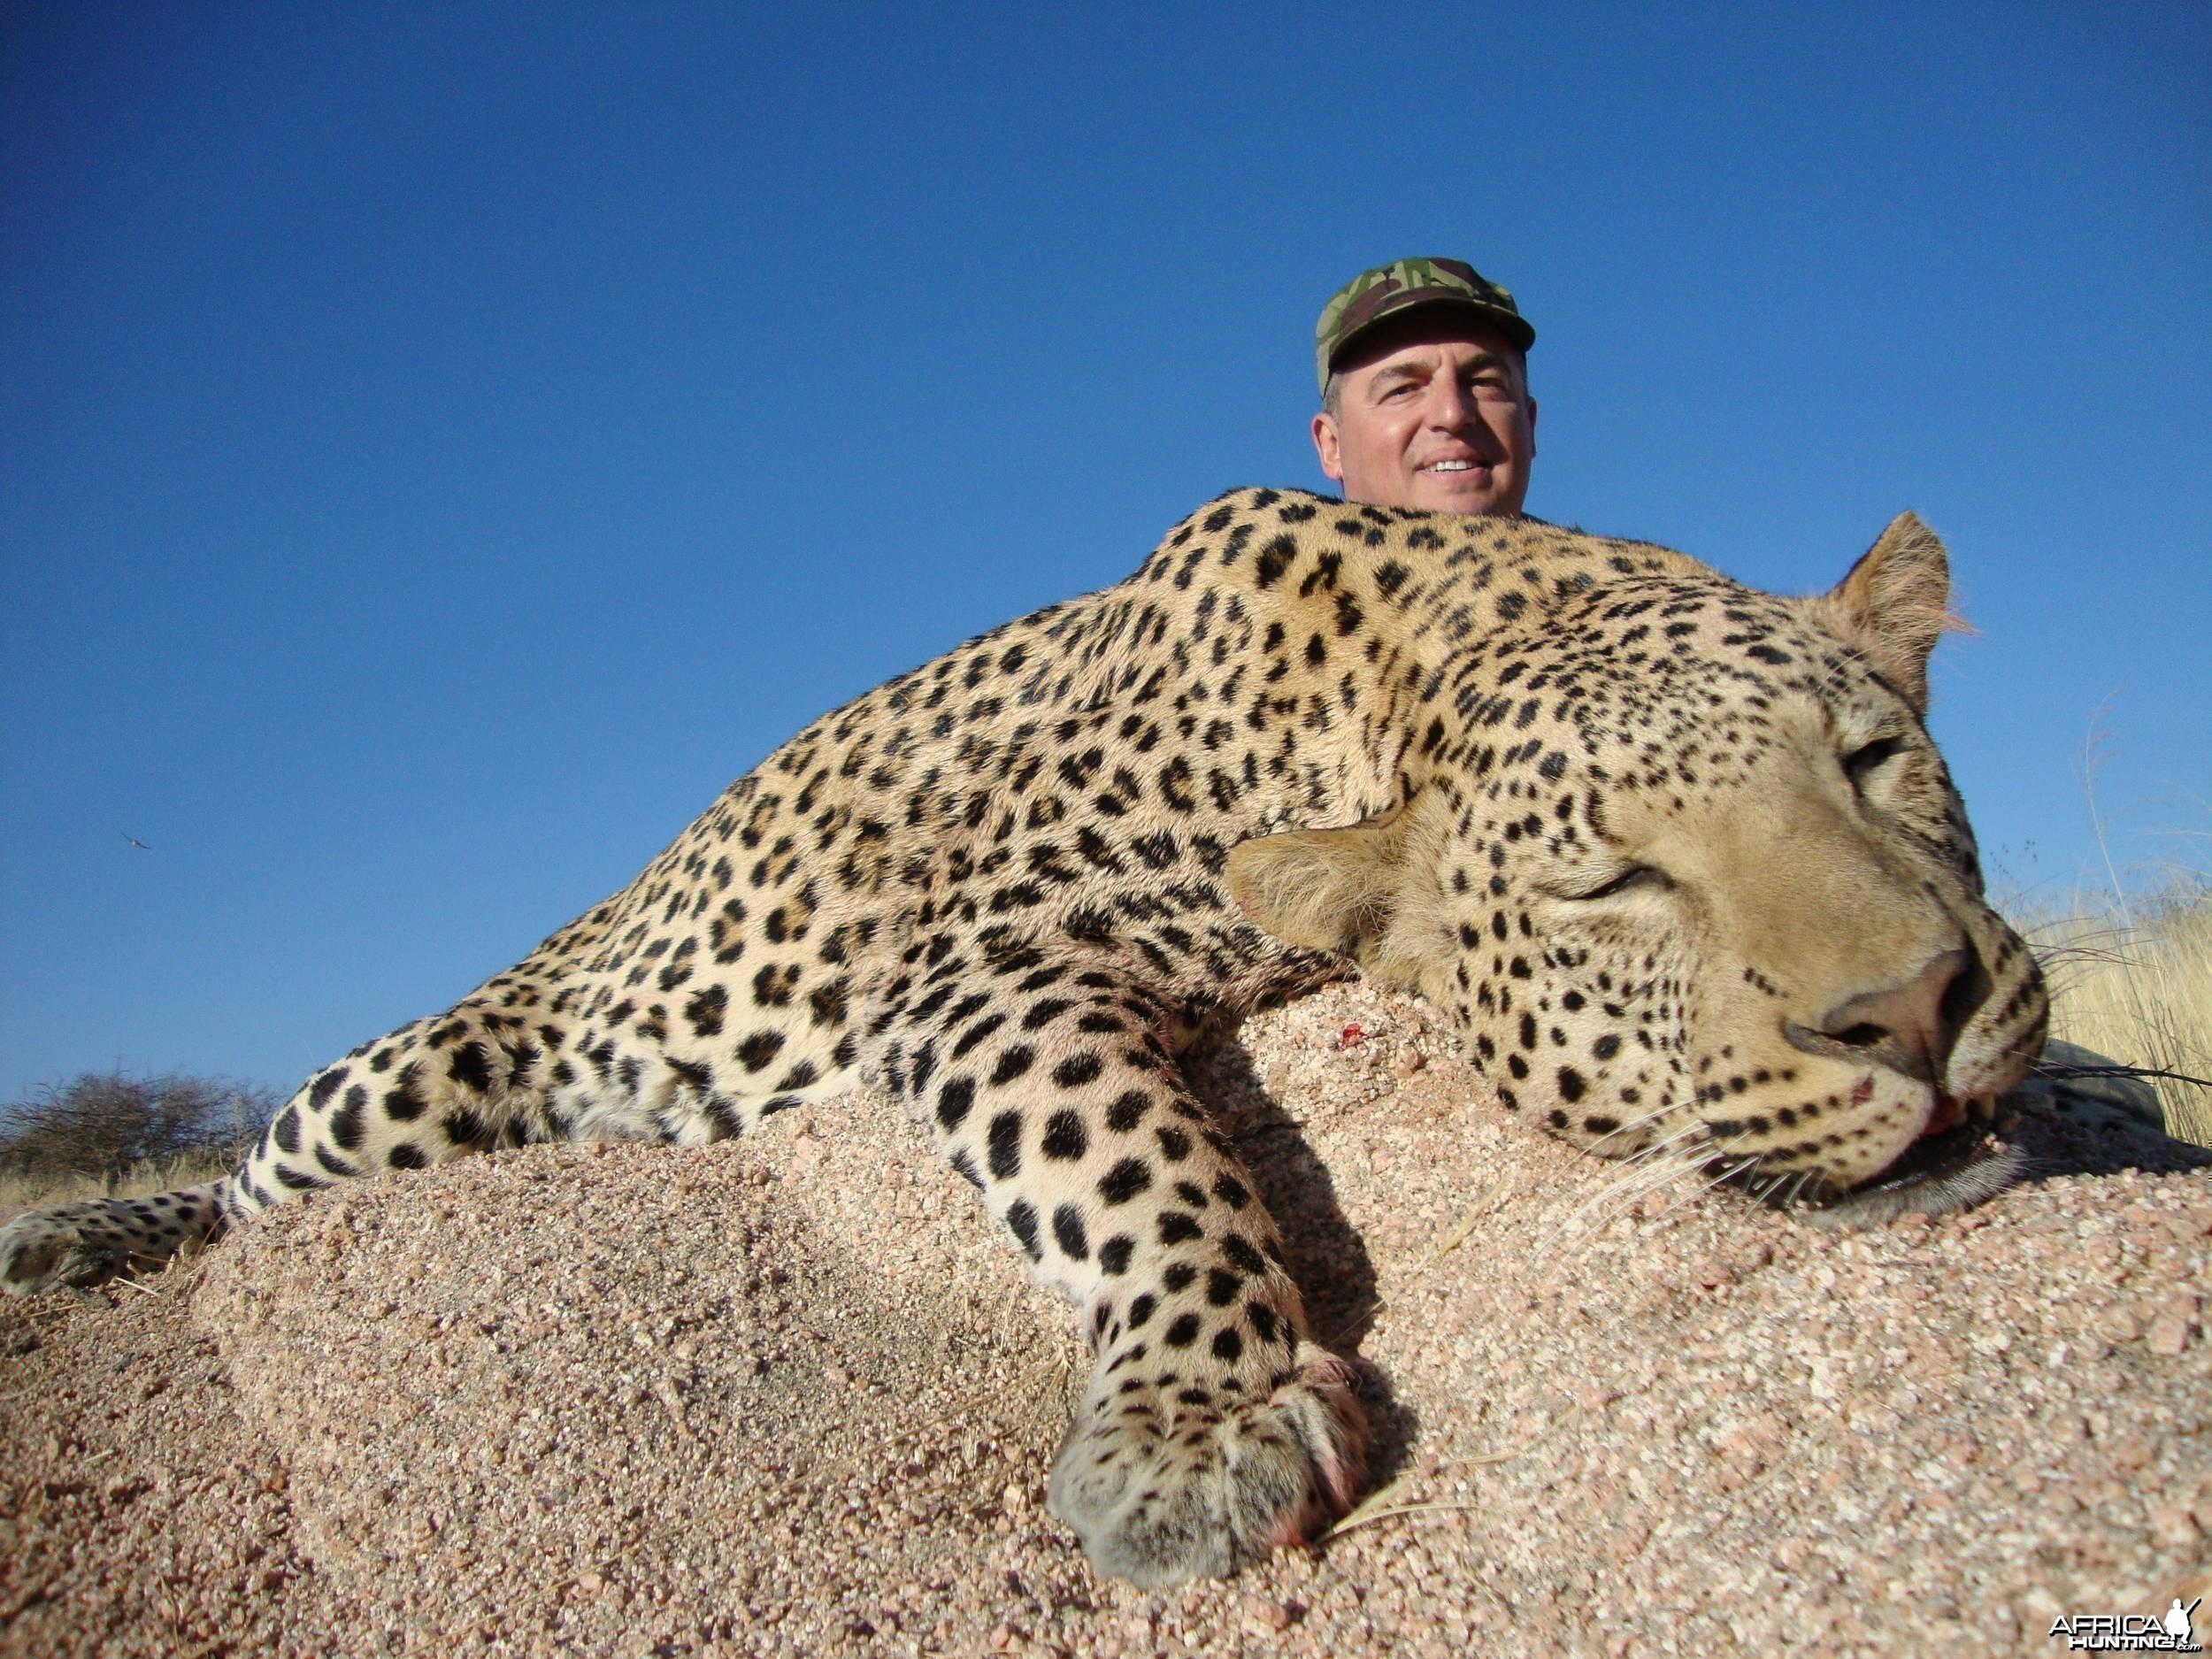 Leopard Hunting -  Yuriy Nikitenko Russia